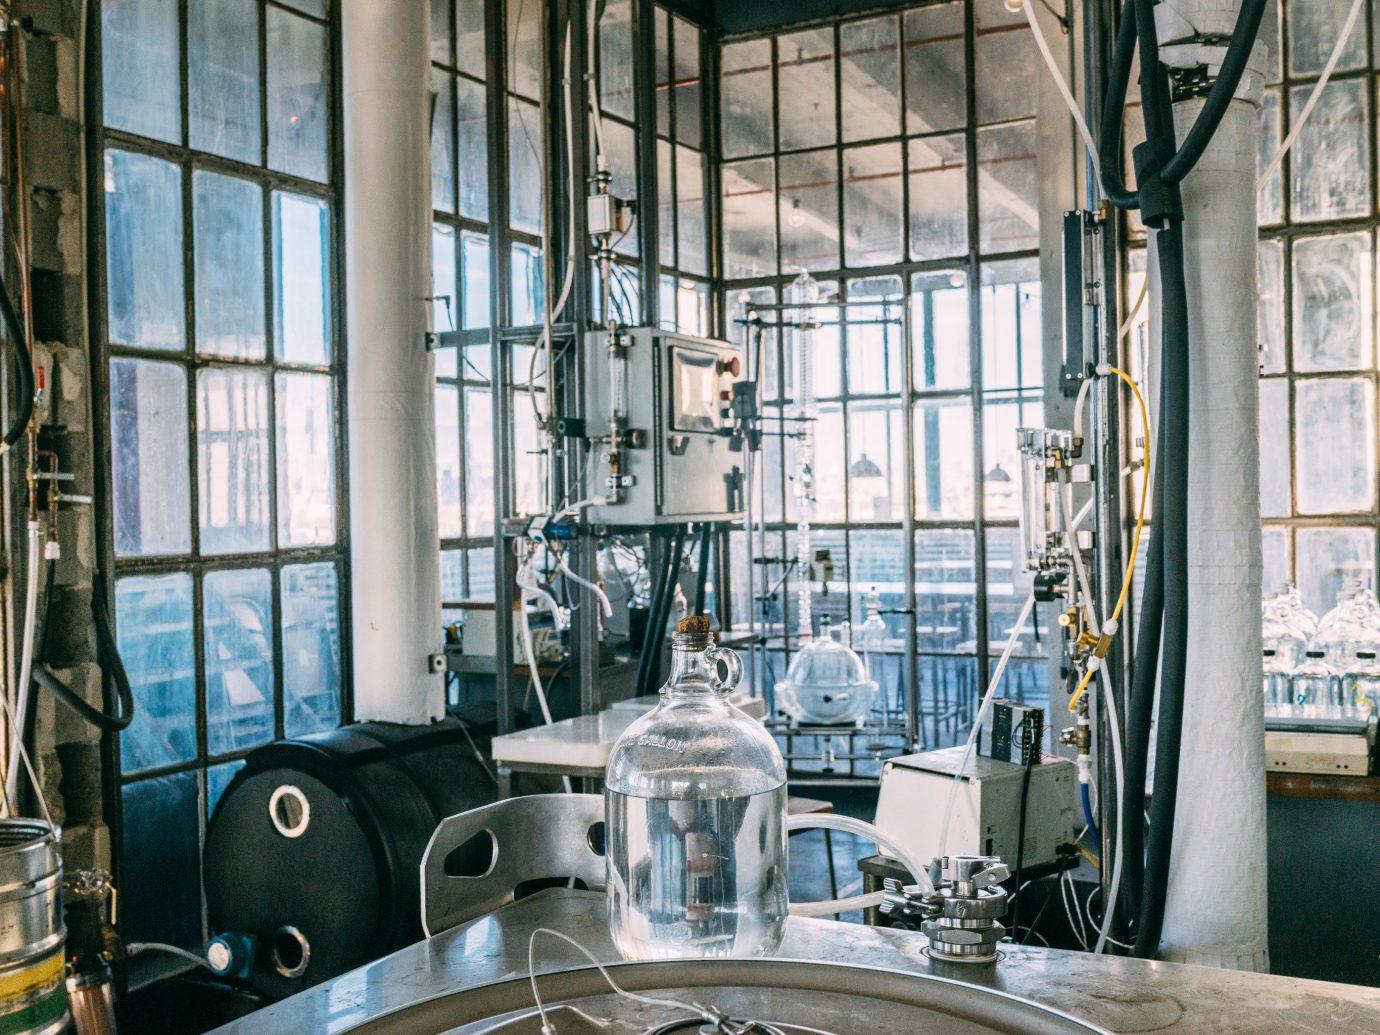 Brooklyn Food + Drink industry factory building window glass